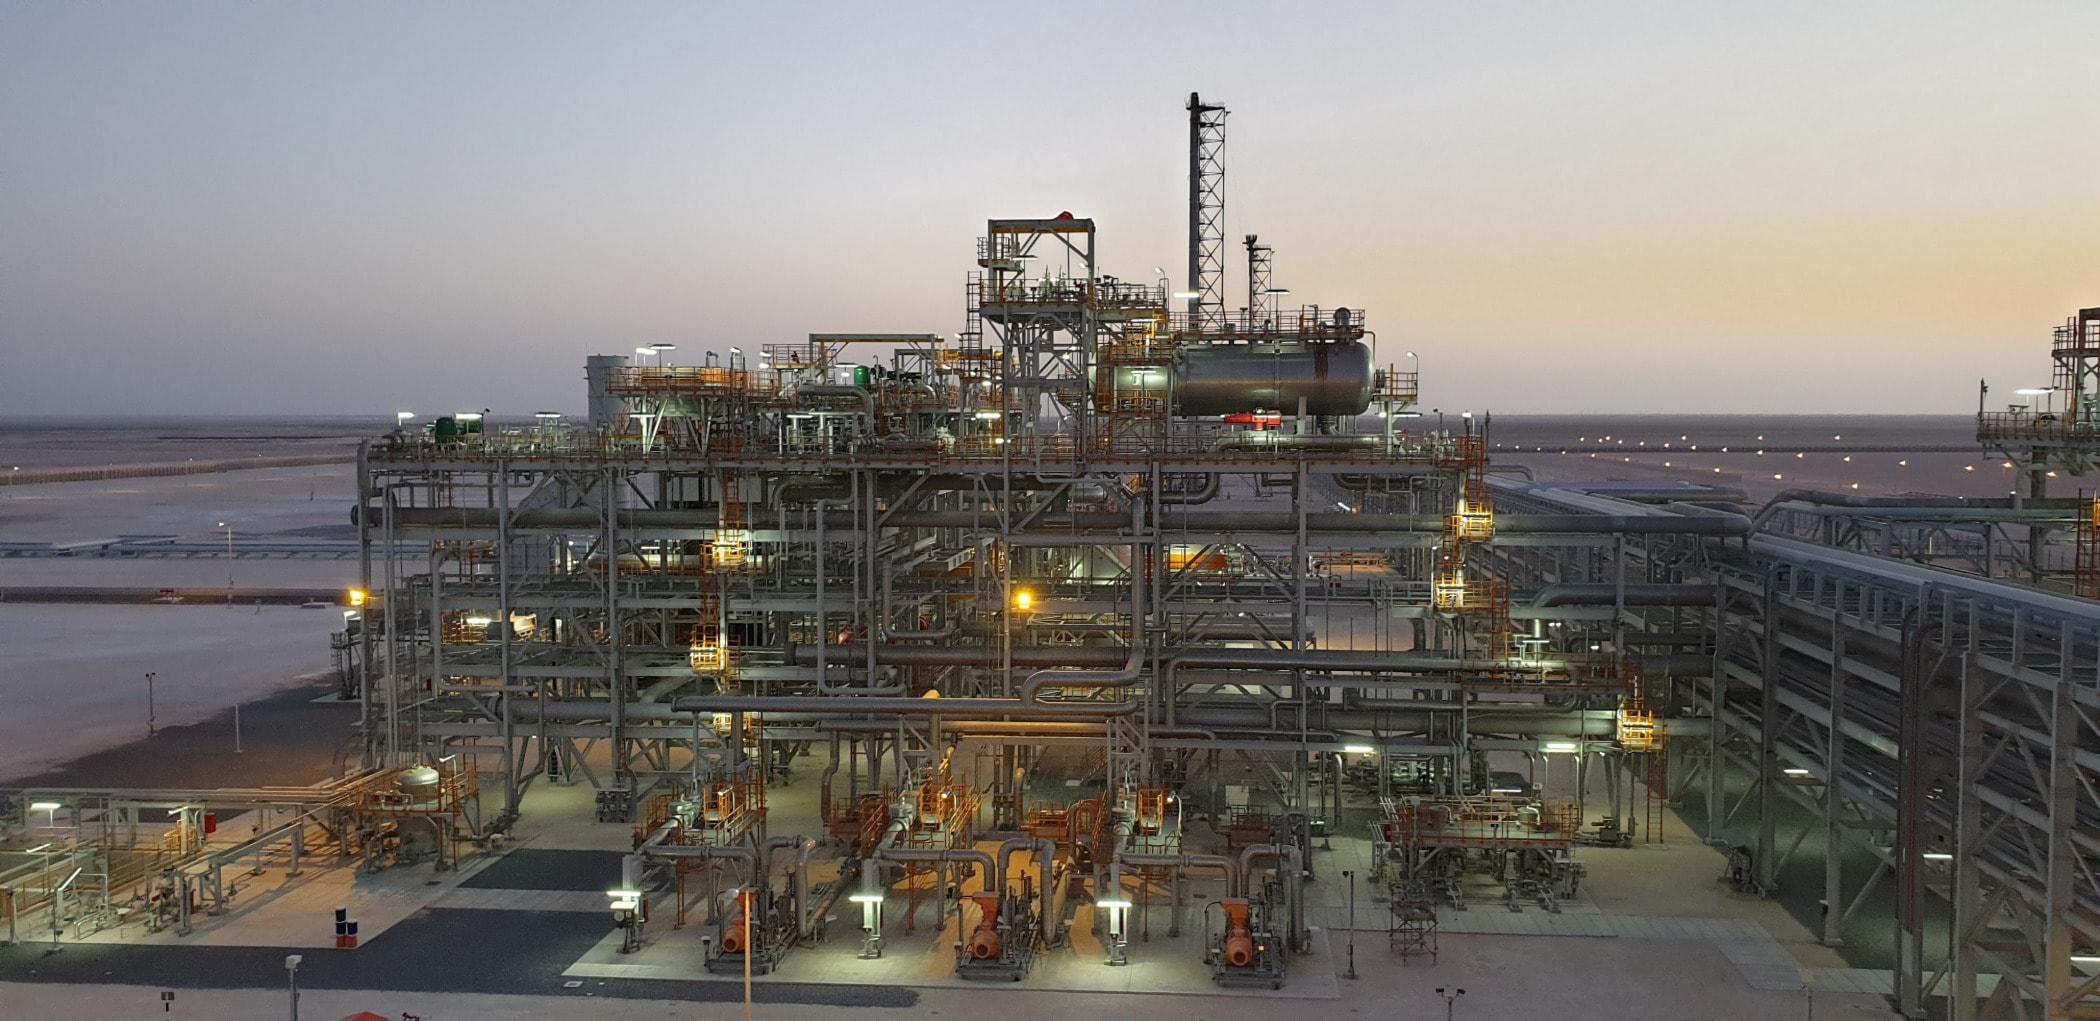 Oil rig, Industry